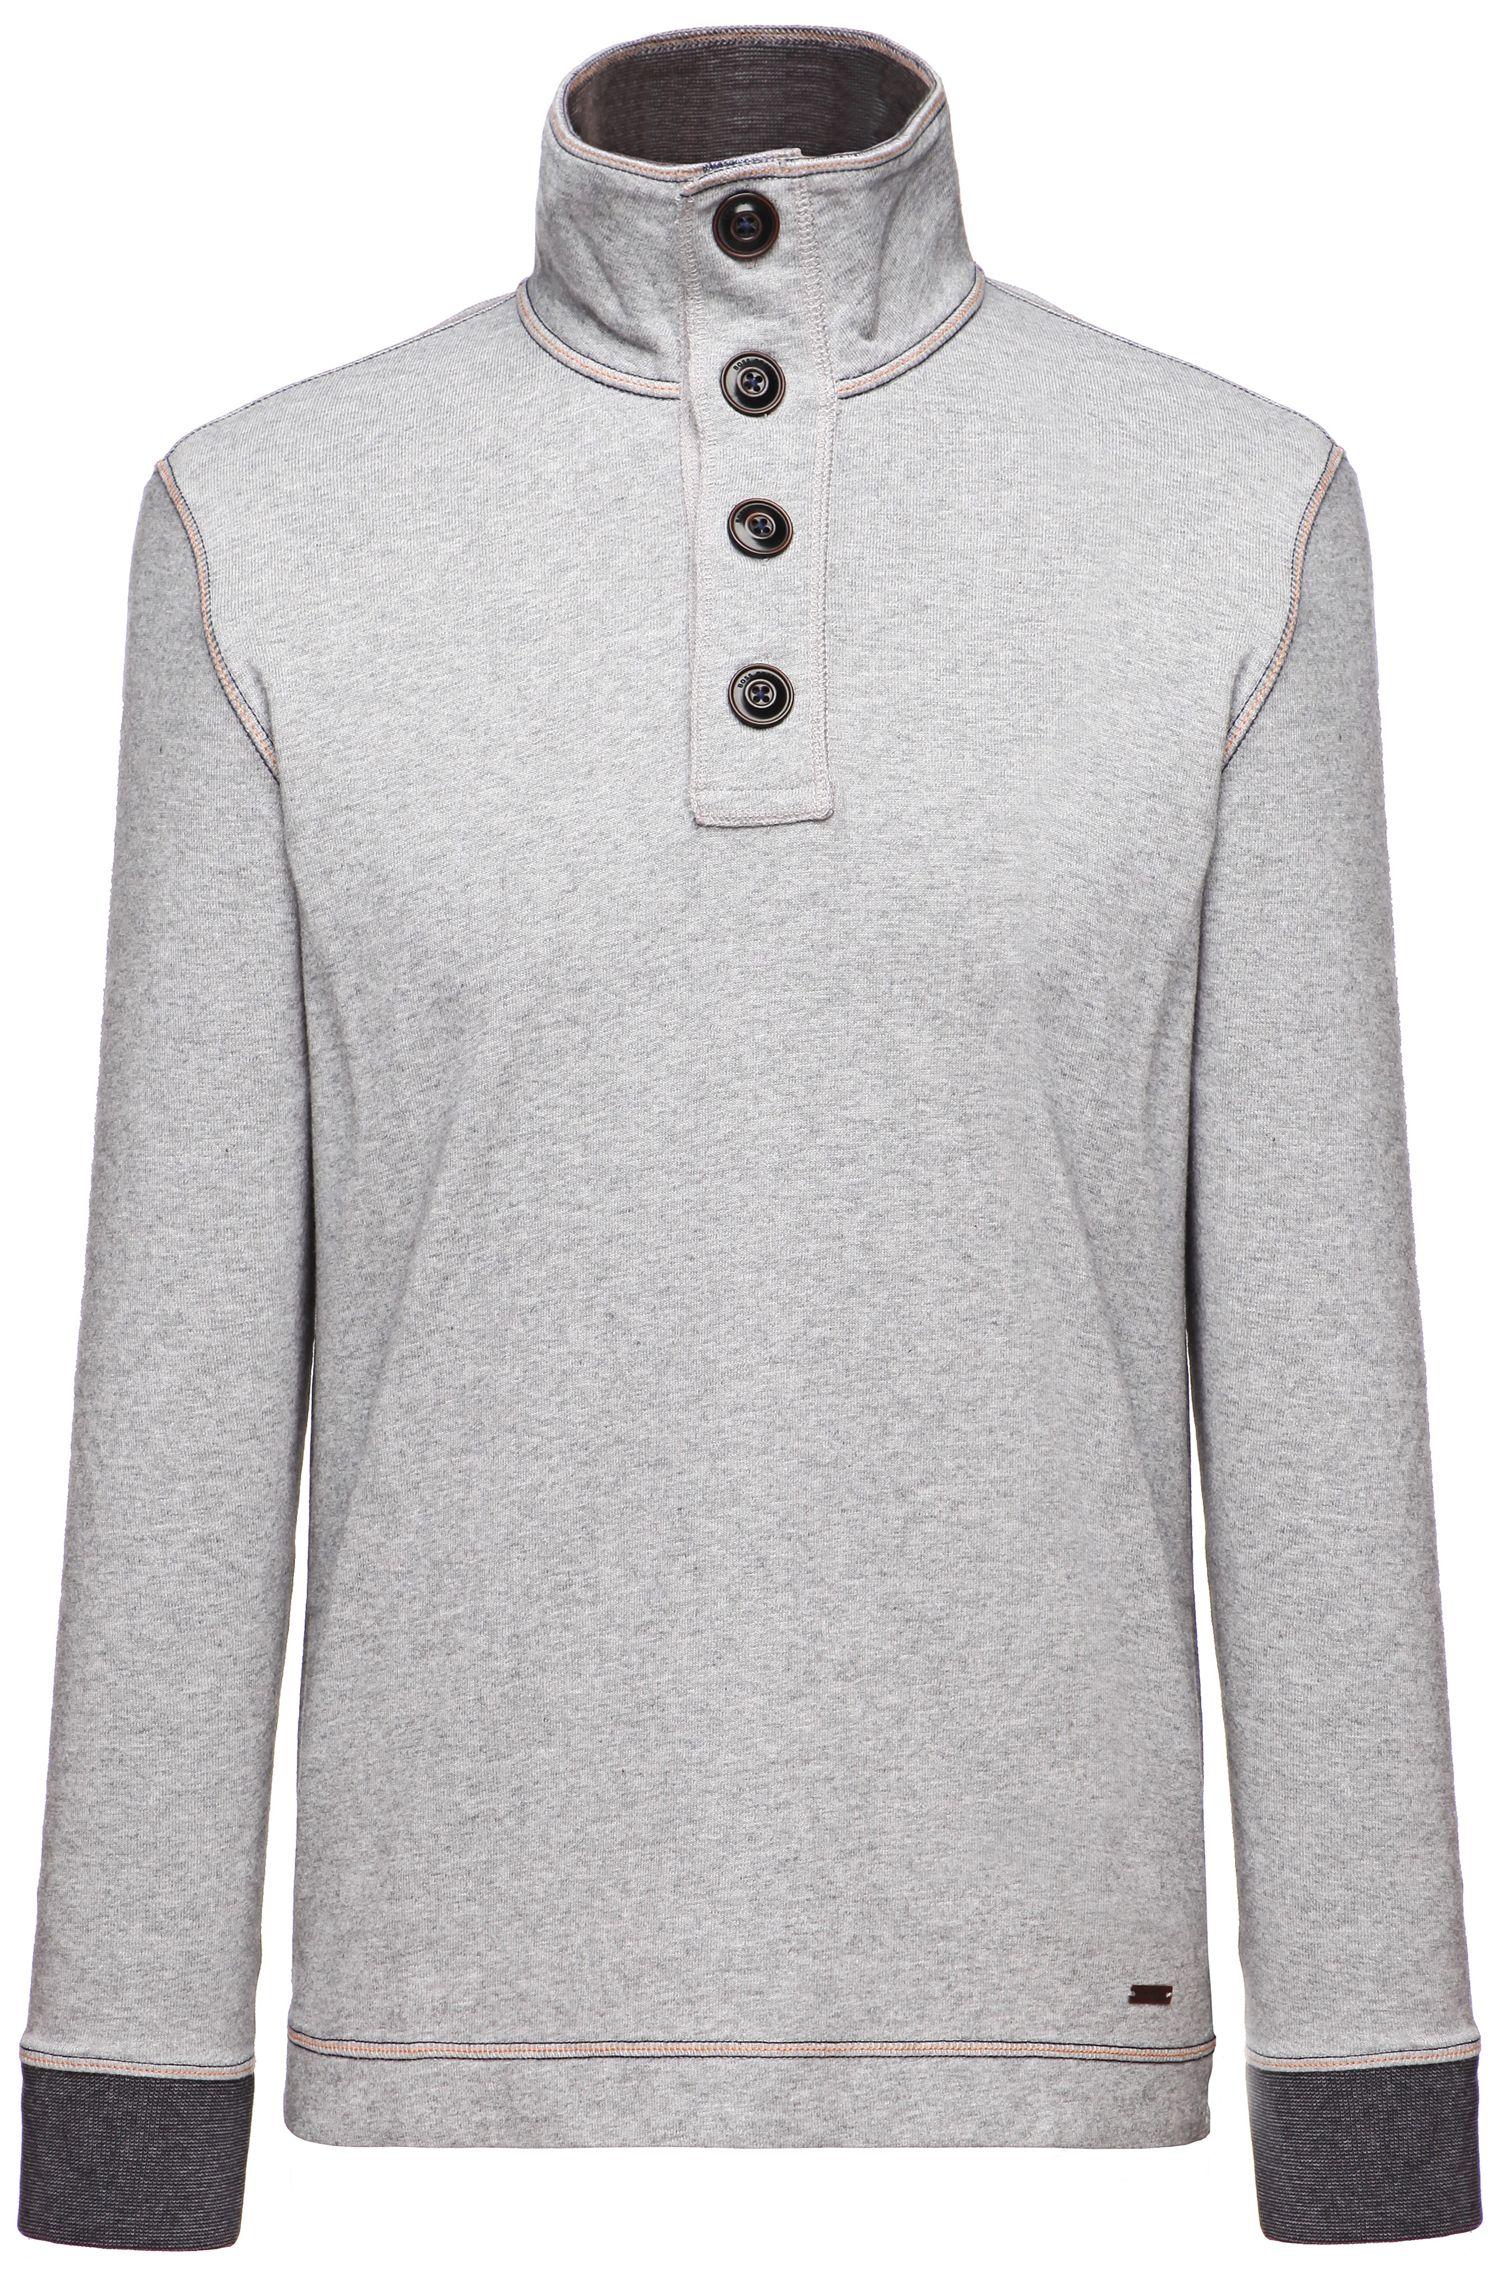 'Whoosh' | Cotton Troyer Collar Sweatshirt